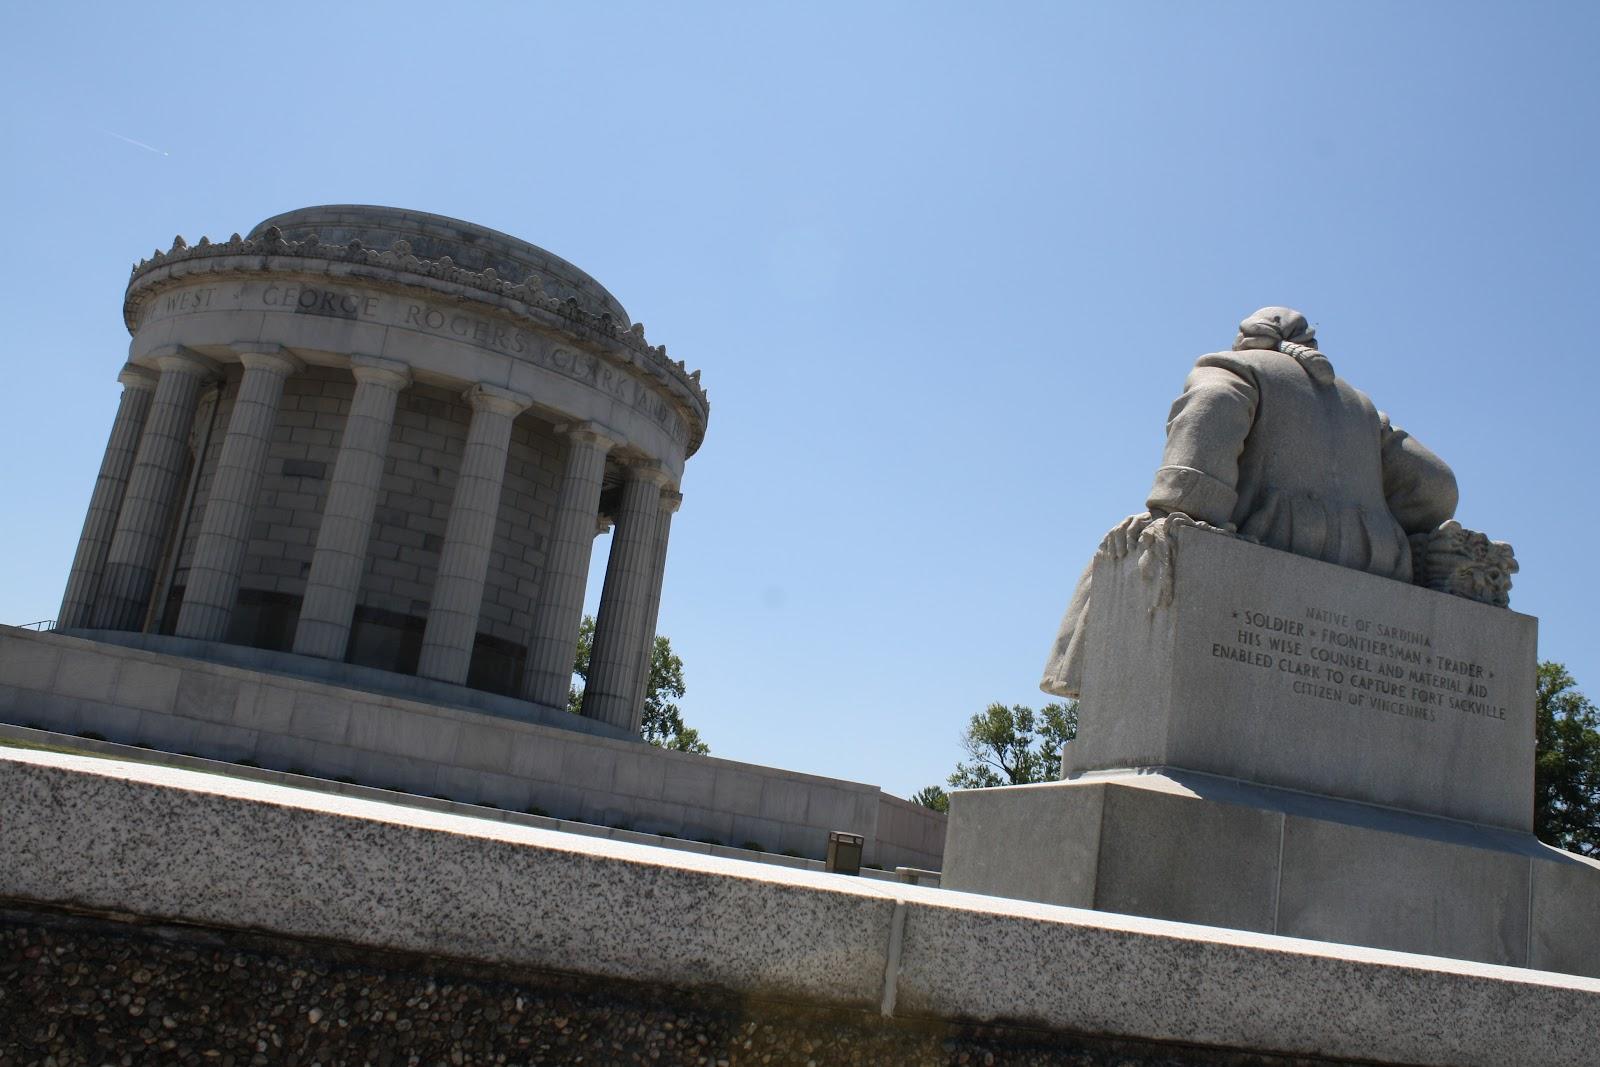 george rogers clark memorial - photo #27